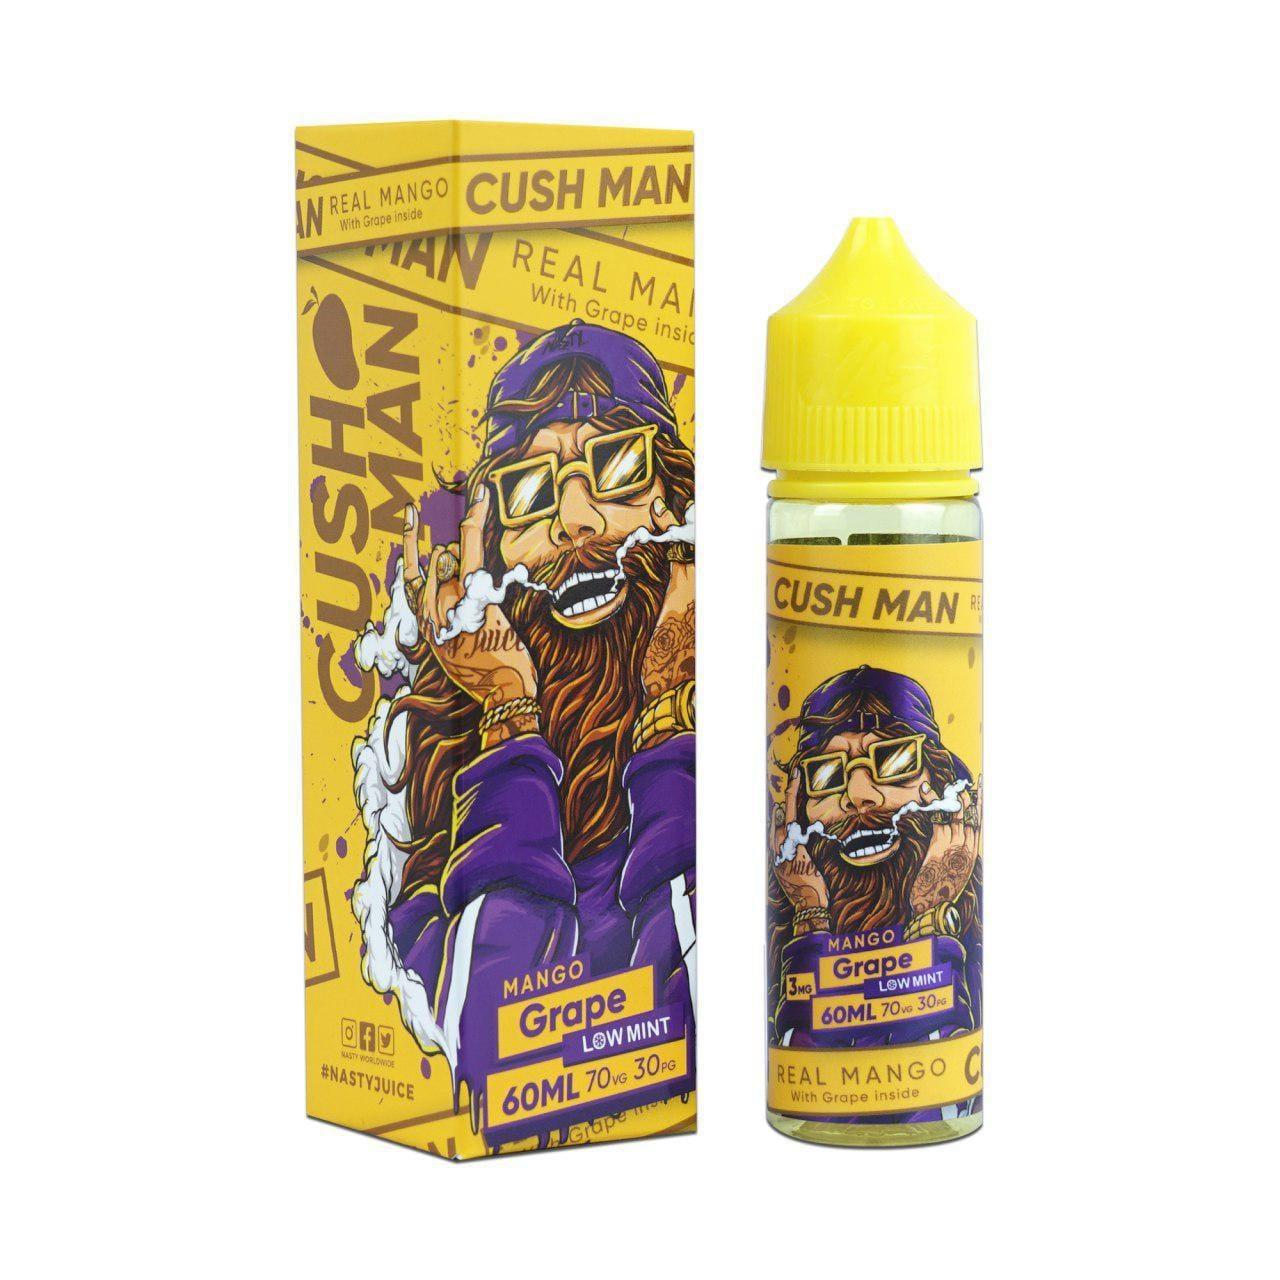 Nasty Vape Juice Cush Man Series Mango Grape 60ml